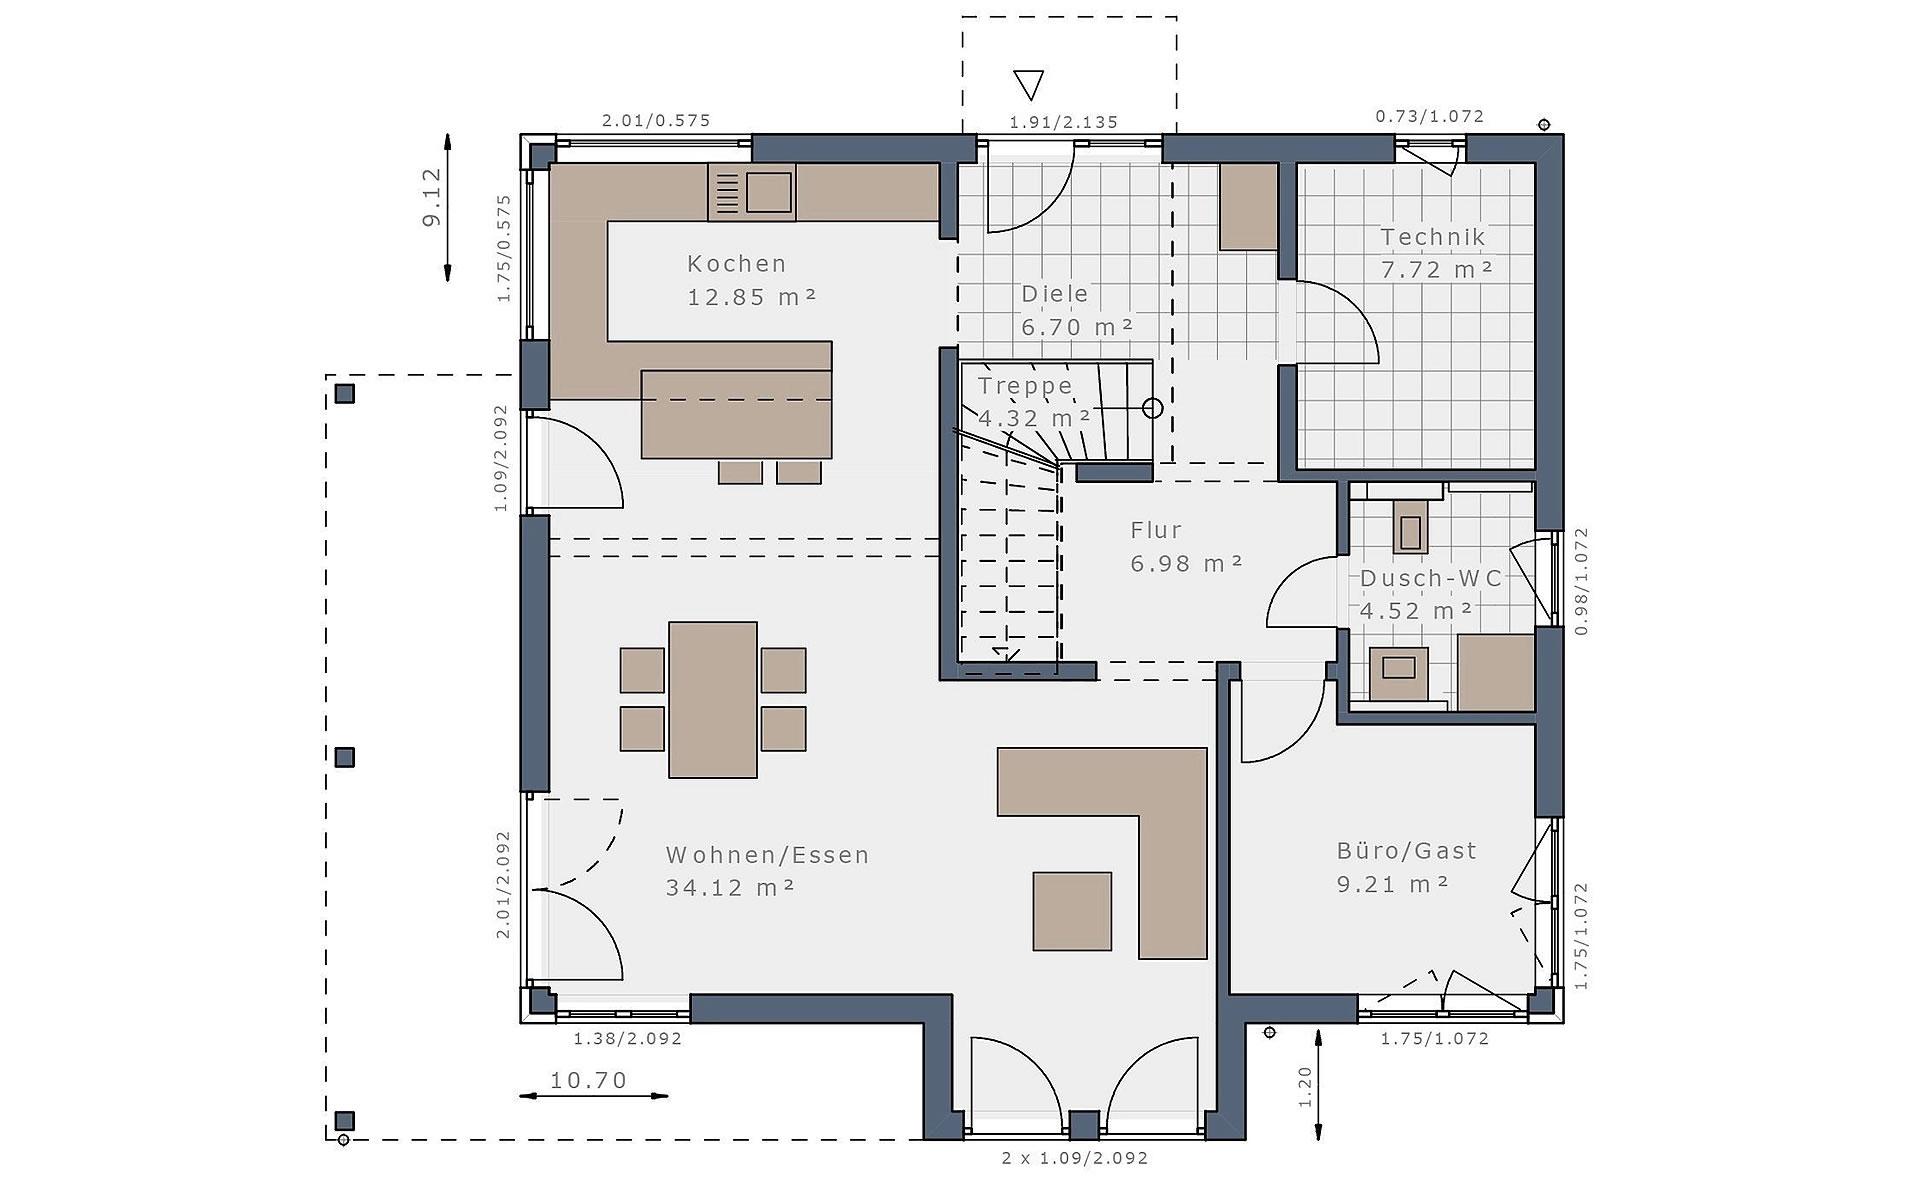 Erdgeschoss Solitaire-E-165 E4 von Schwabenhaus GmbH & Co. KG